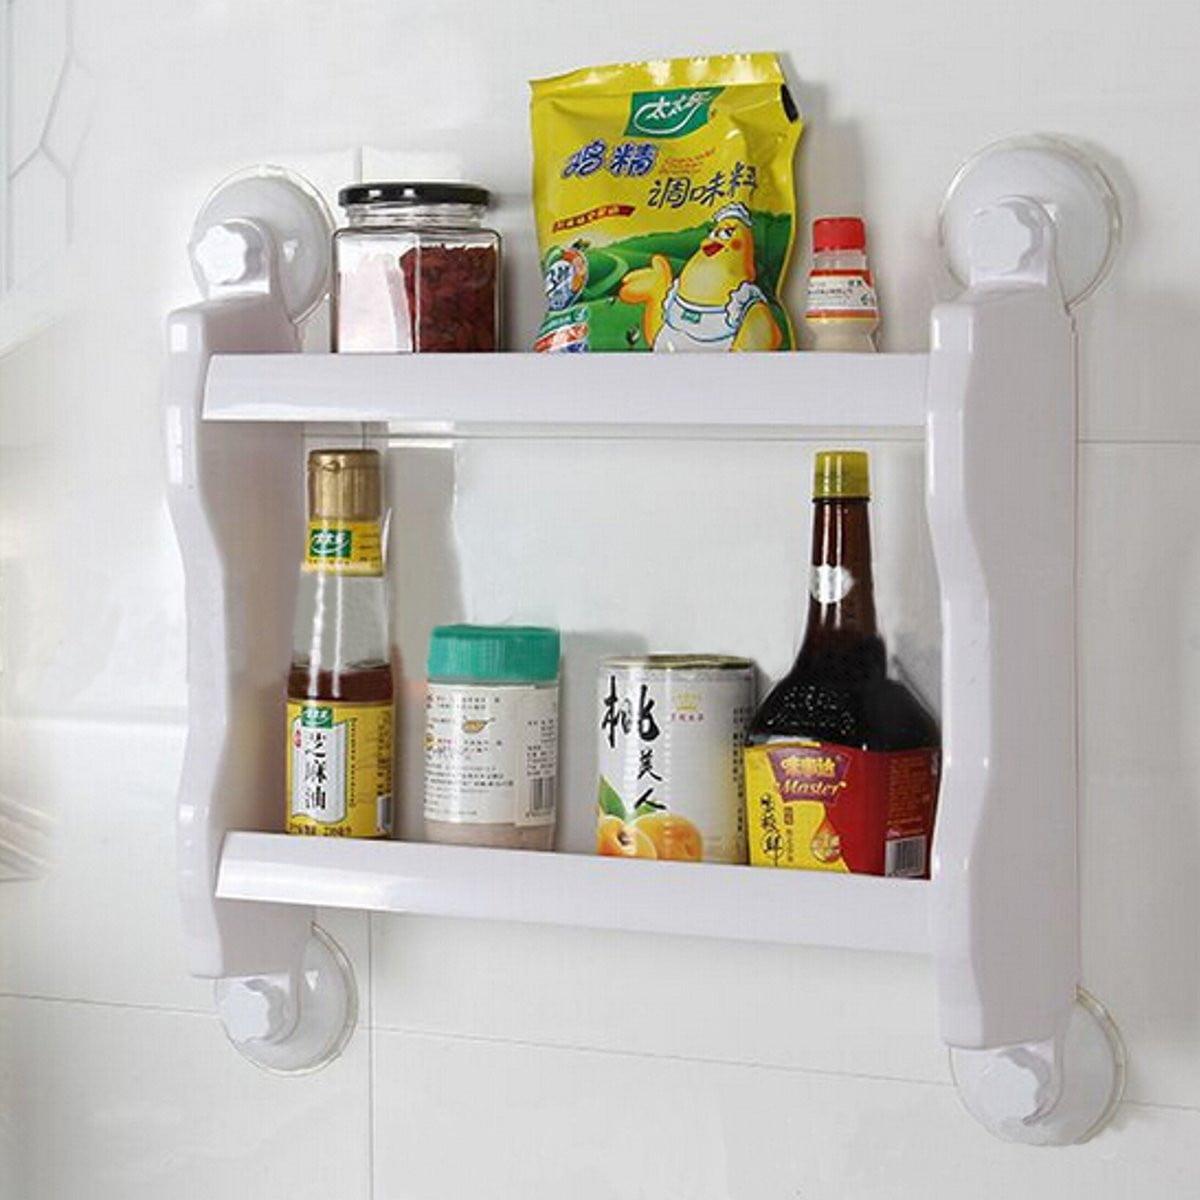 Bathroom Organisers Caddies Bathroom Suction Cup Kitchen Wall Corner Storage Rack Organizer Shower Shelf Ro Home Furniture Diy Lugecook Com Br